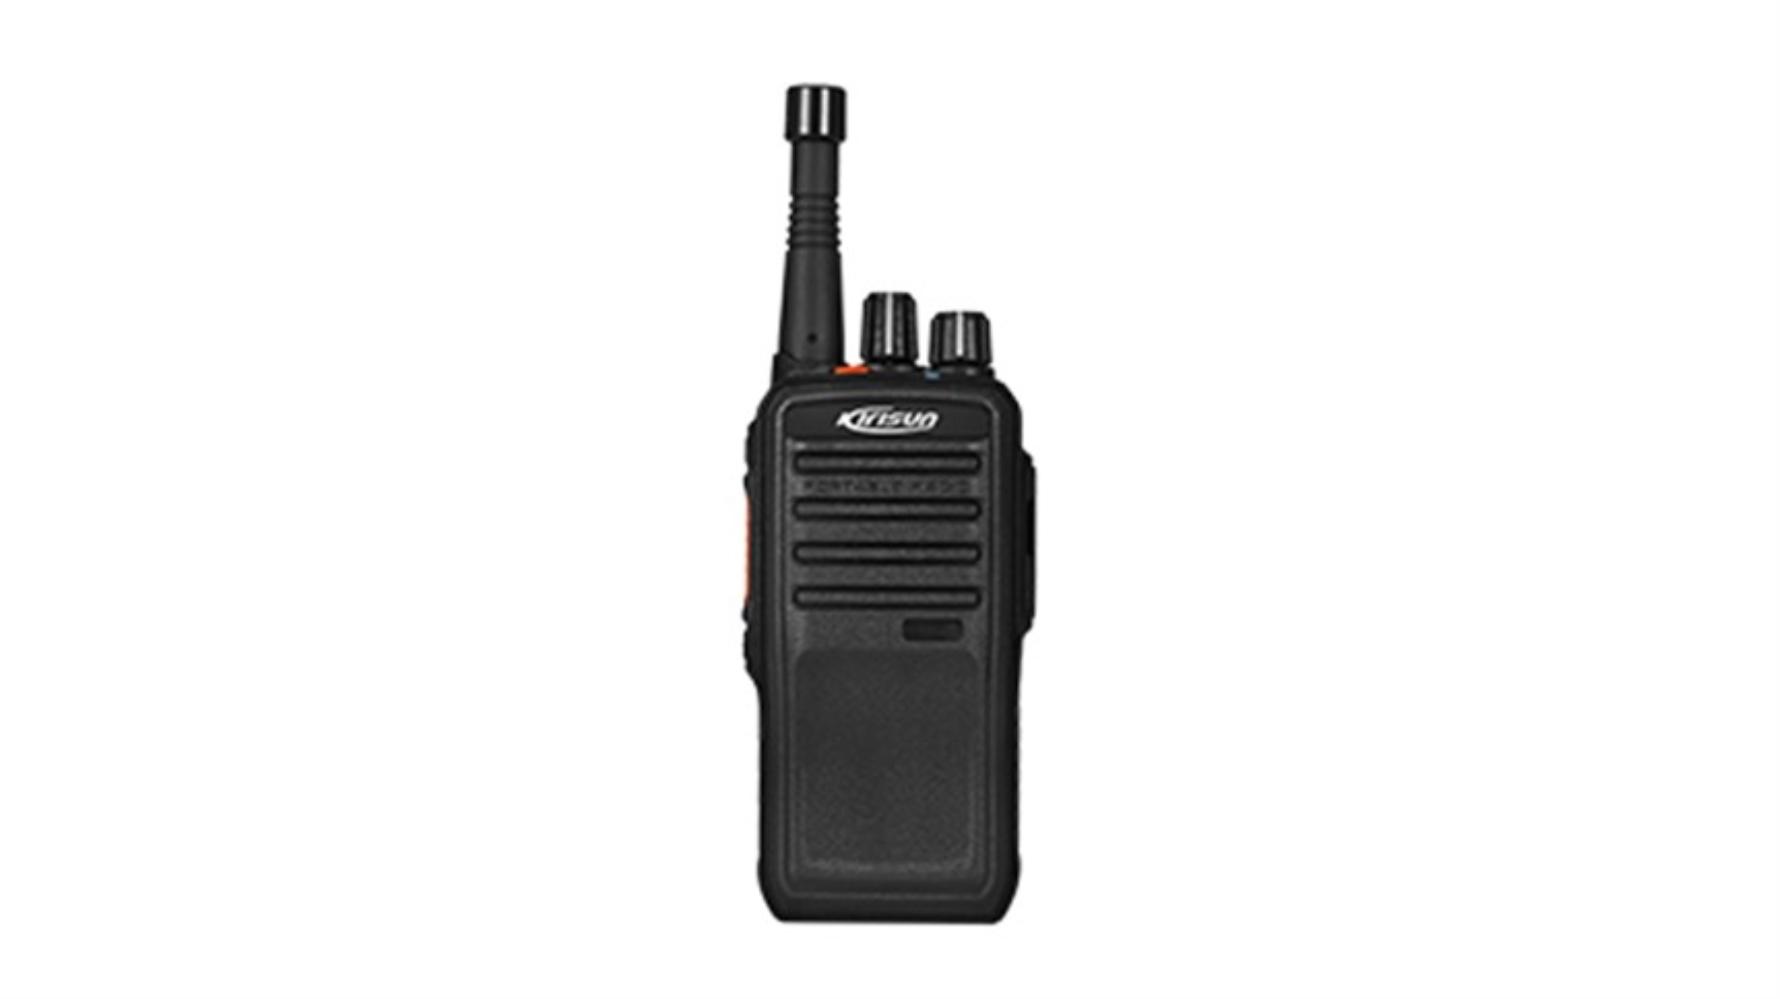 photo of Kirisun W65 Push to talk (ptt) over wi-fi / cellular, portable two way radio